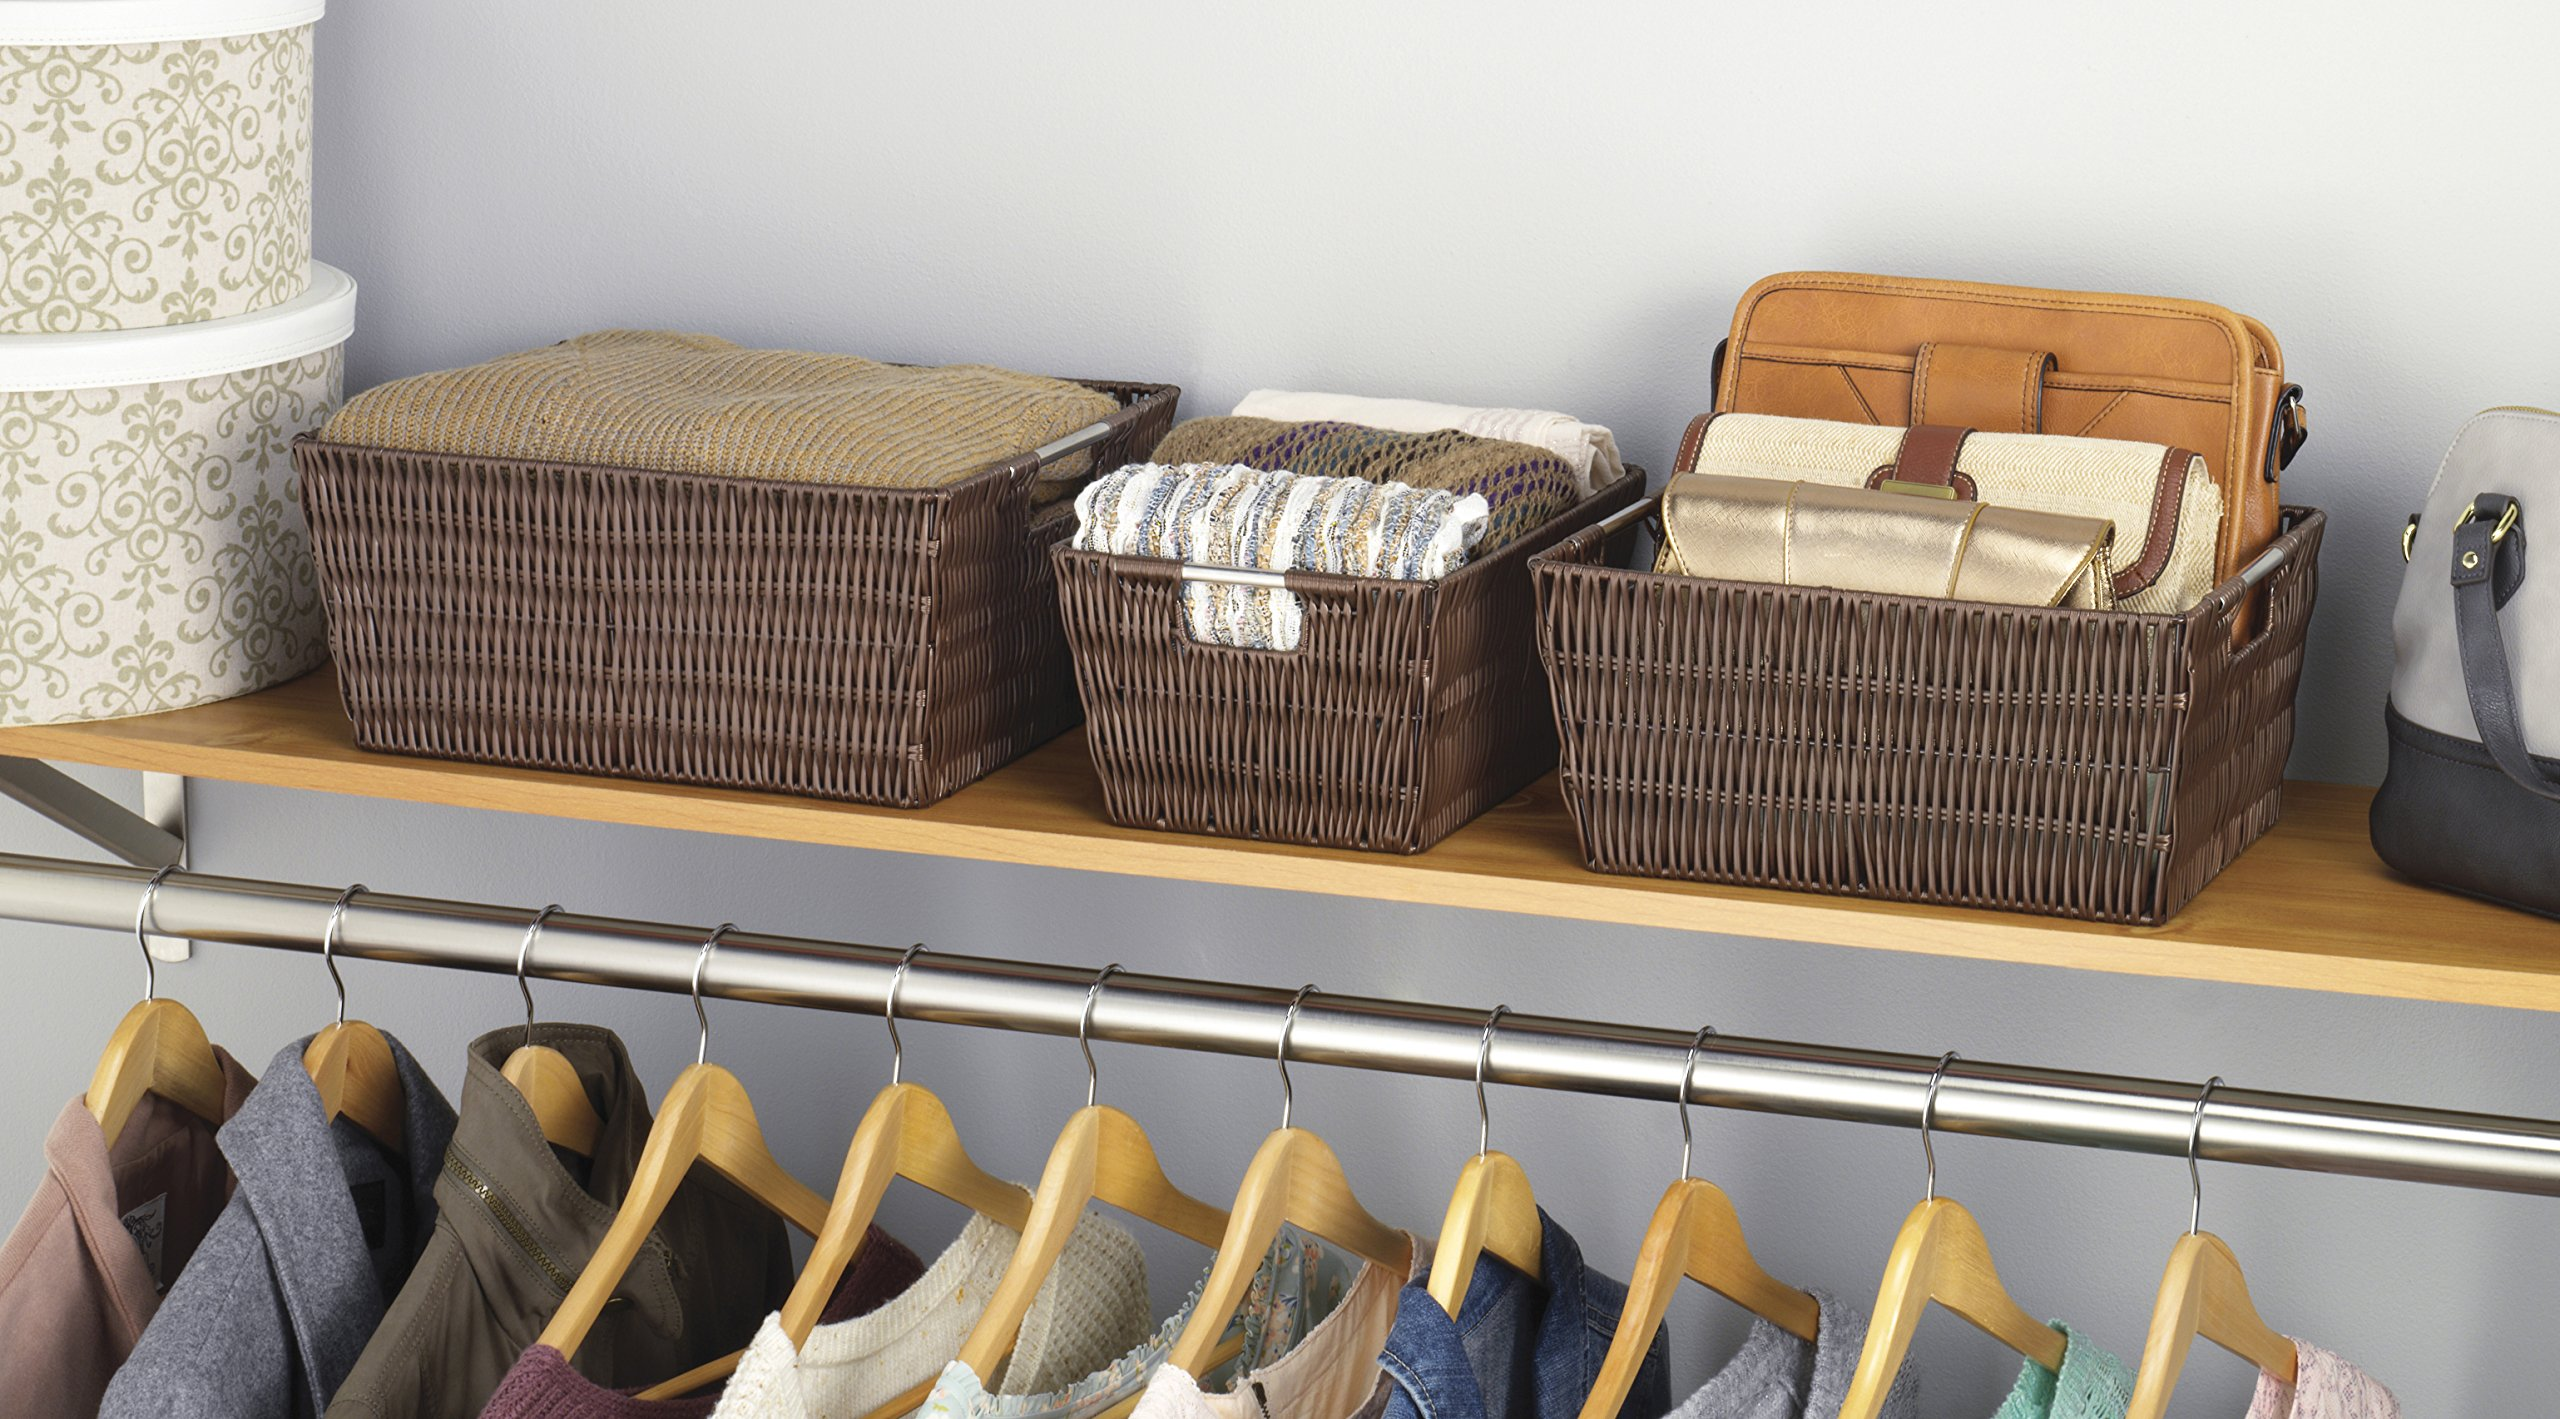 Whitmor Rattique Storage Baskets Set of 3 Java - 6500-1959-JAVA u003c Baskets Bins u0026 Containers u003c Home u0026 Kitchen - TIBS & Whitmor Rattique Storage Baskets Set of 3 Java - 6500-1959-JAVA ...